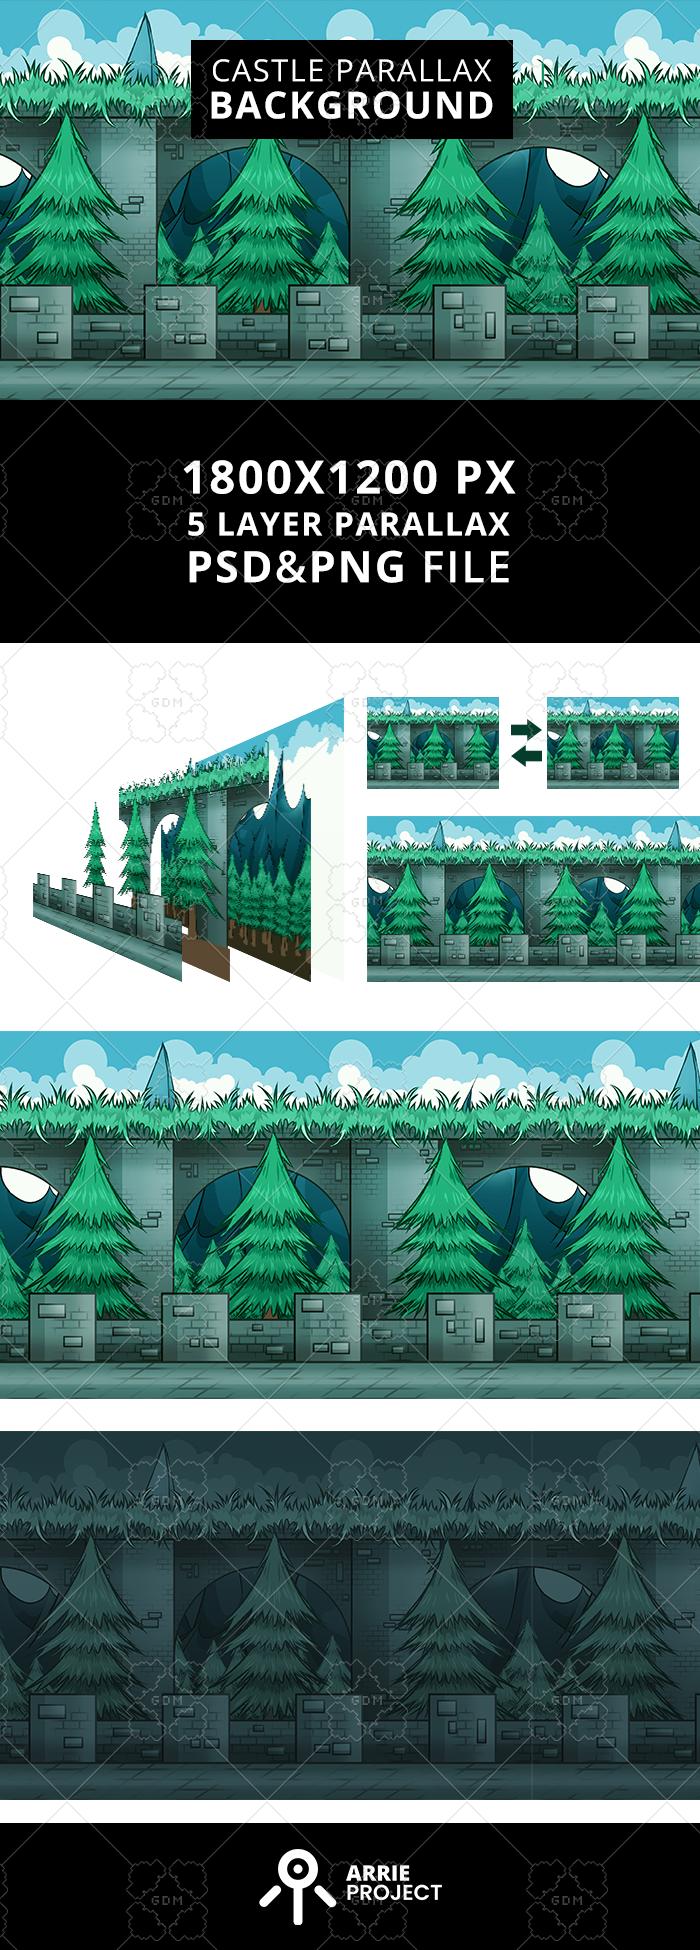 Castle Parallax Background